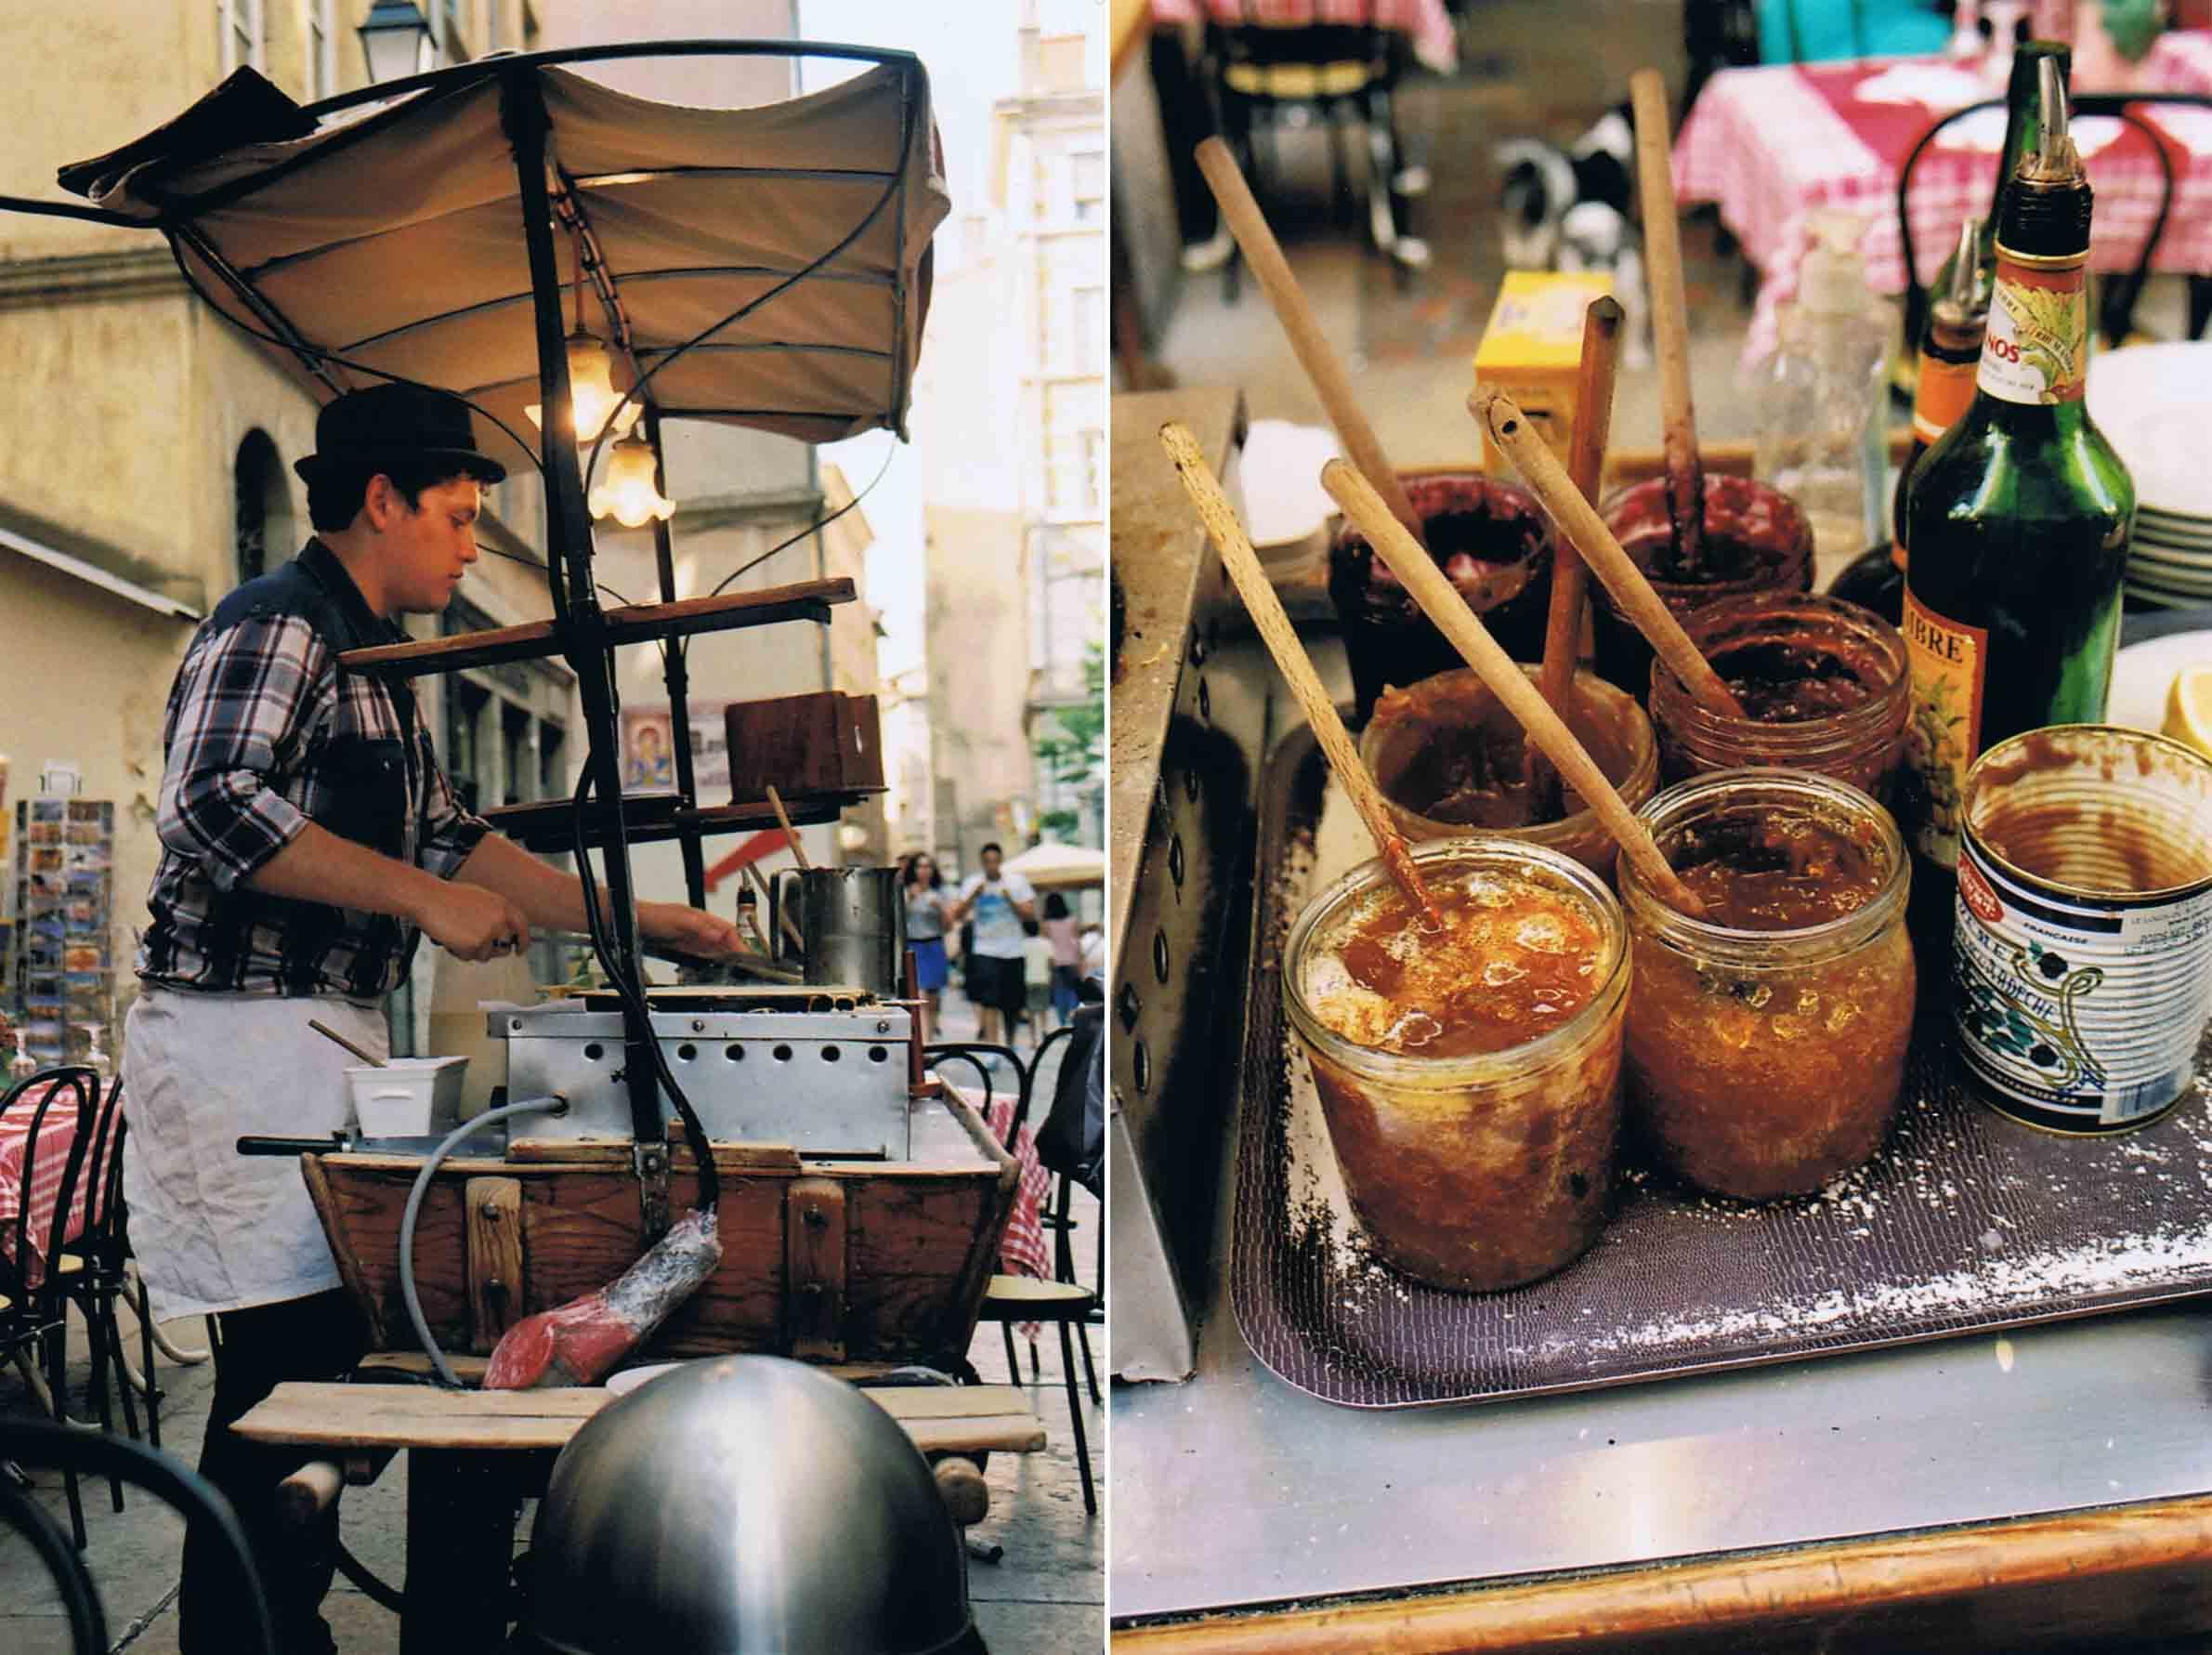 Crepe frz spezialität Lyon Street Food